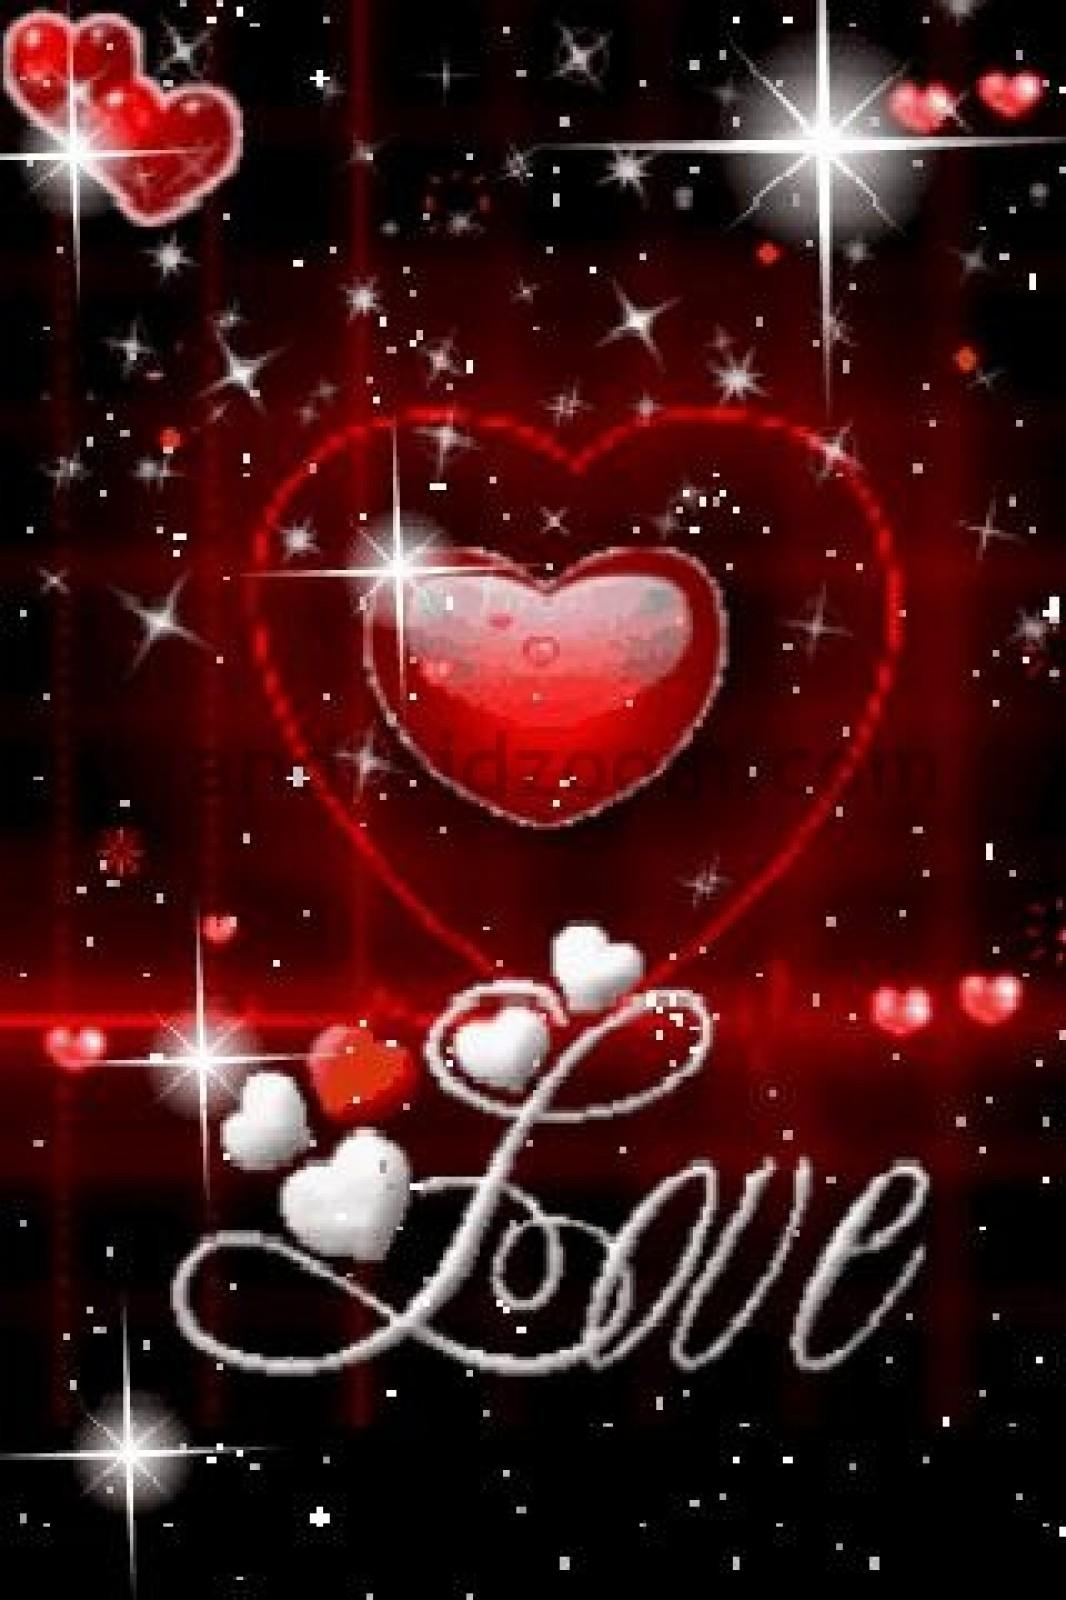 Gambar Wallpaper Love Cinta Gambar Keren Hits